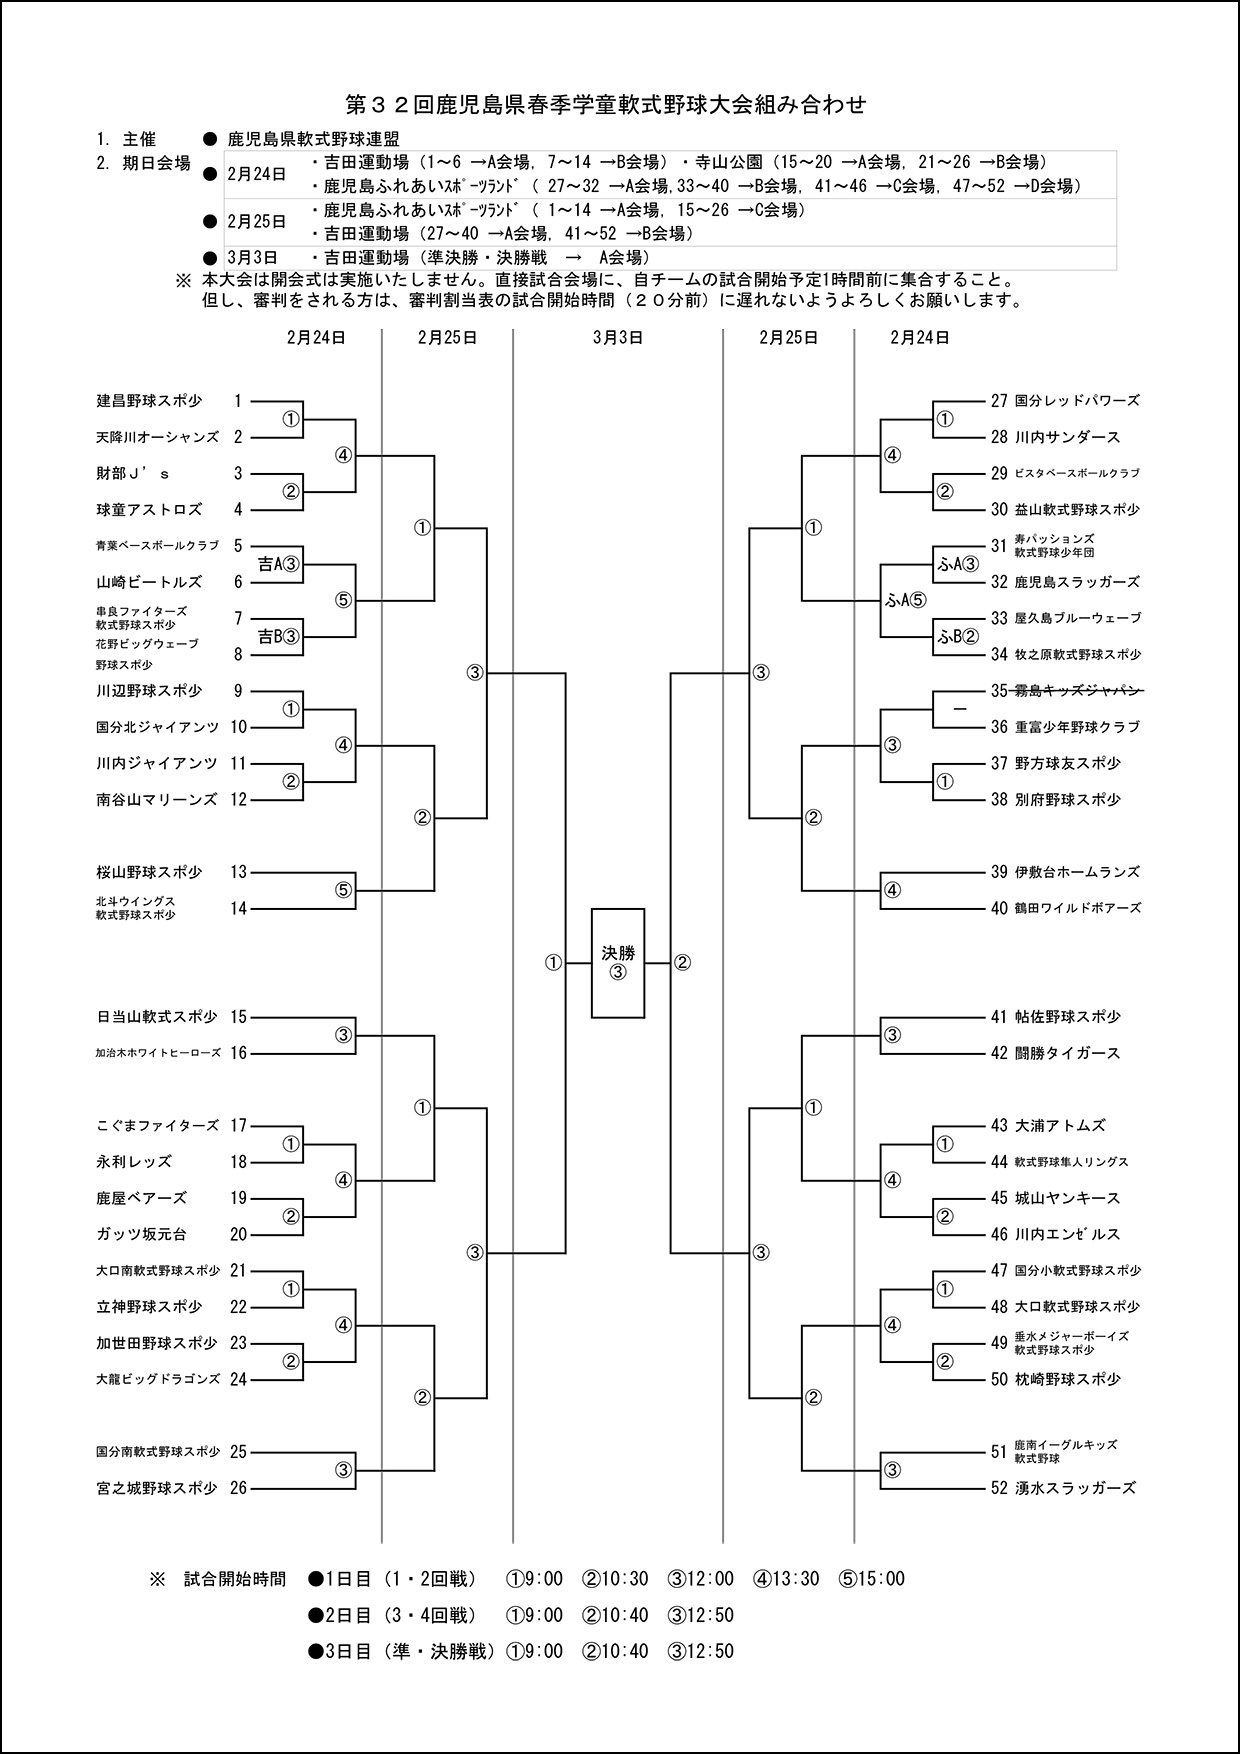 【変更】第32回鹿児島県春季学童軟式野球大会組み合わせ